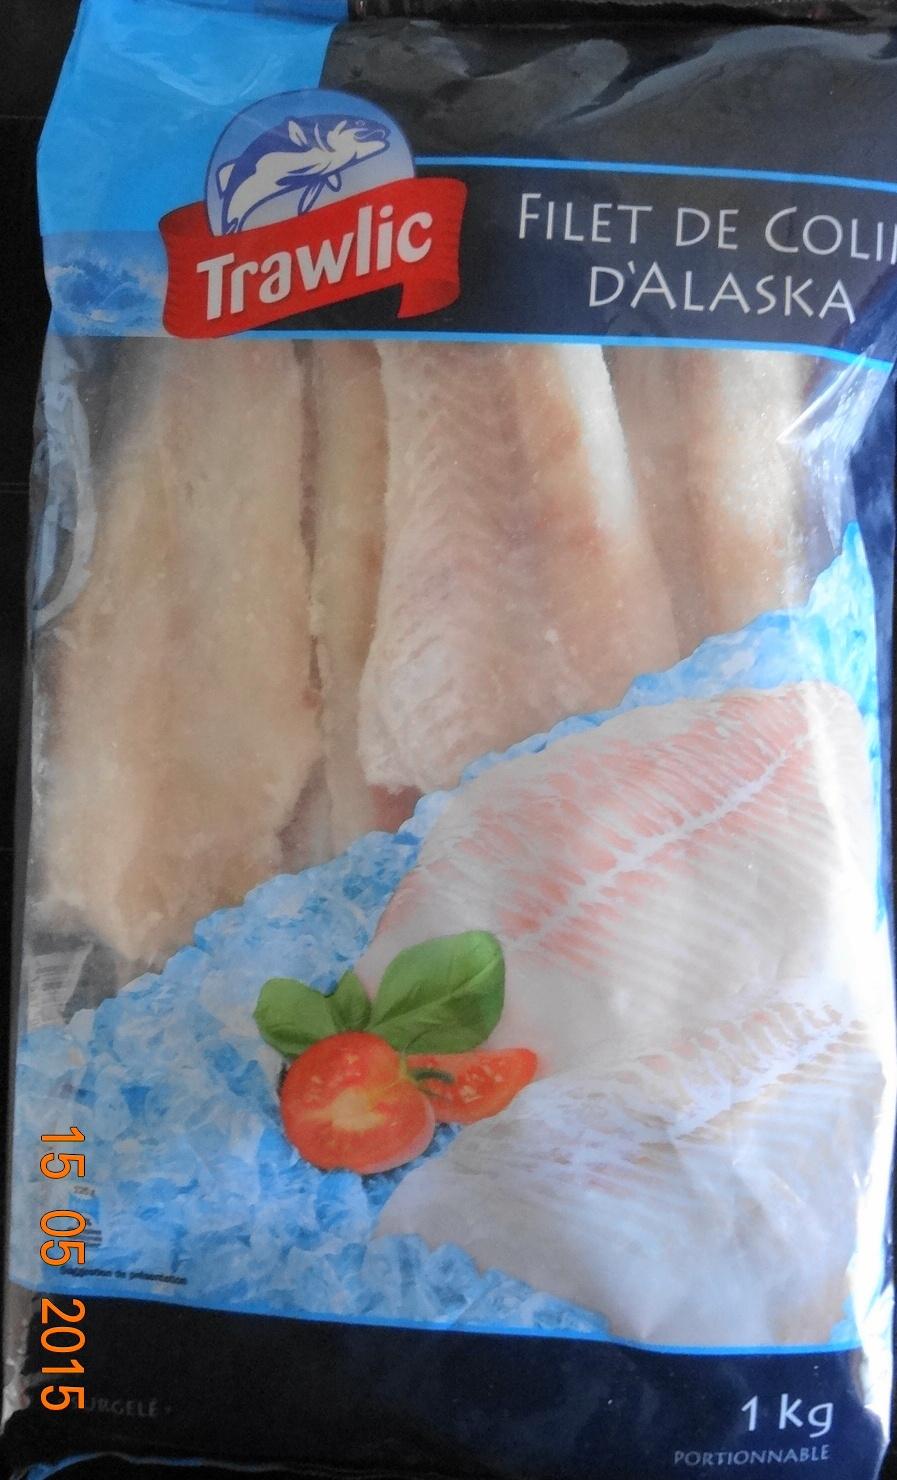 Filet de Colin dAlaska, Surgelé - Product - fr